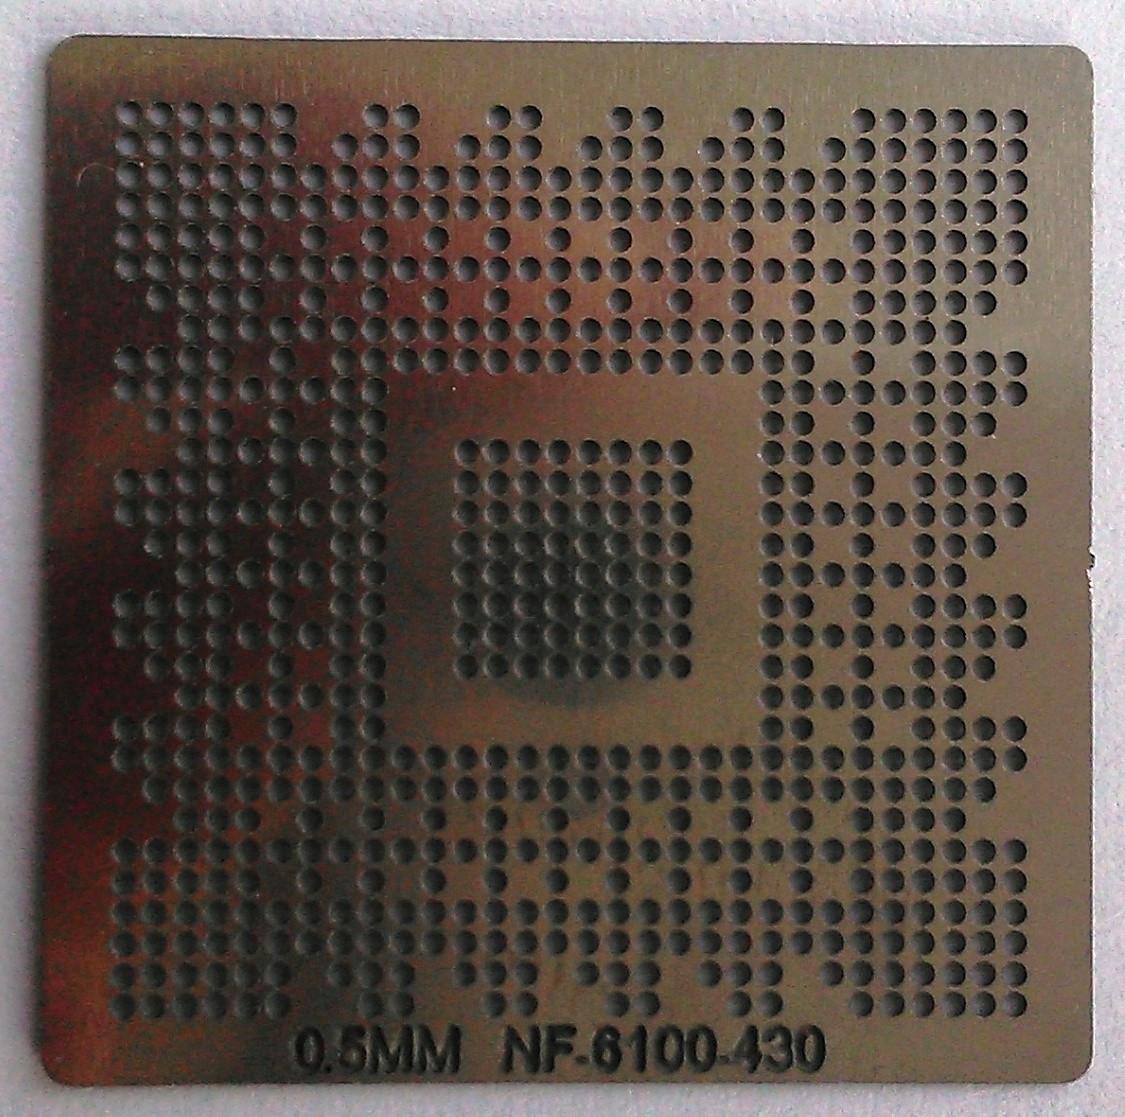 BGA трафарет 0,5 mm NF-6100-430